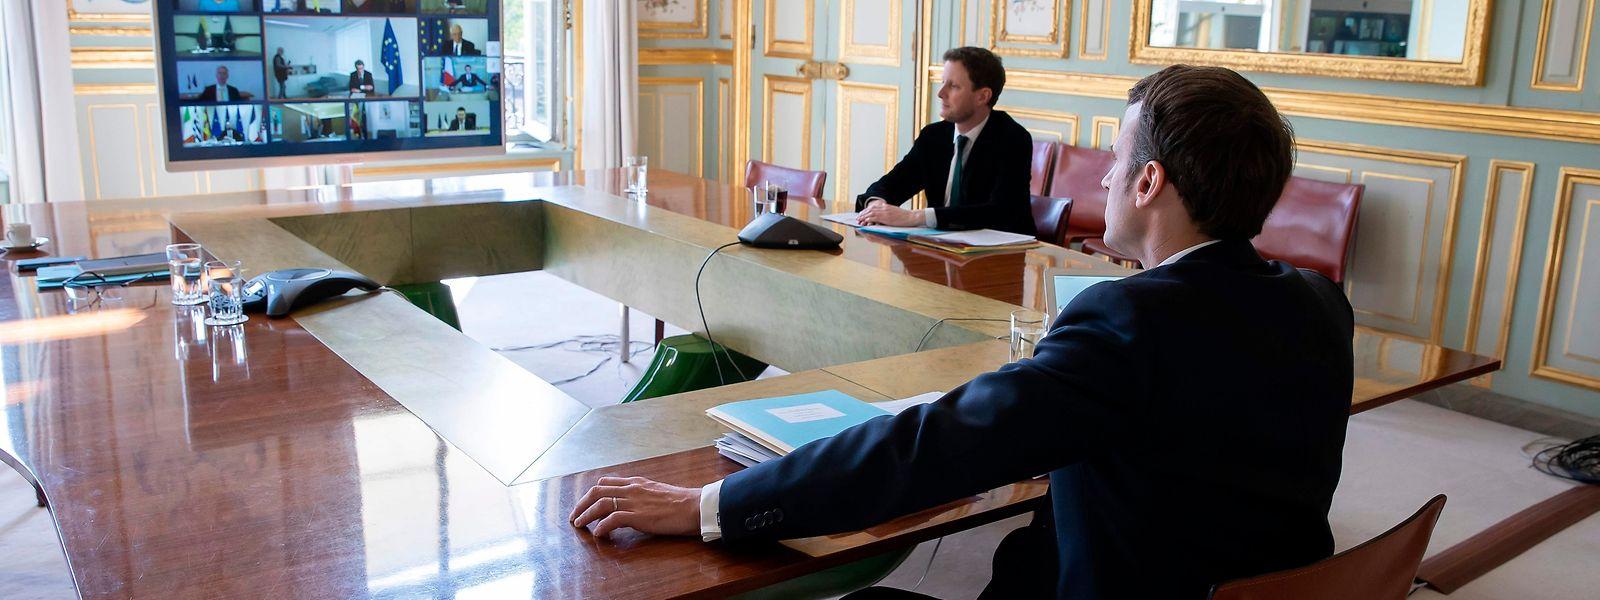 Emmanuel Macron bei einem EU-Videogipfel.